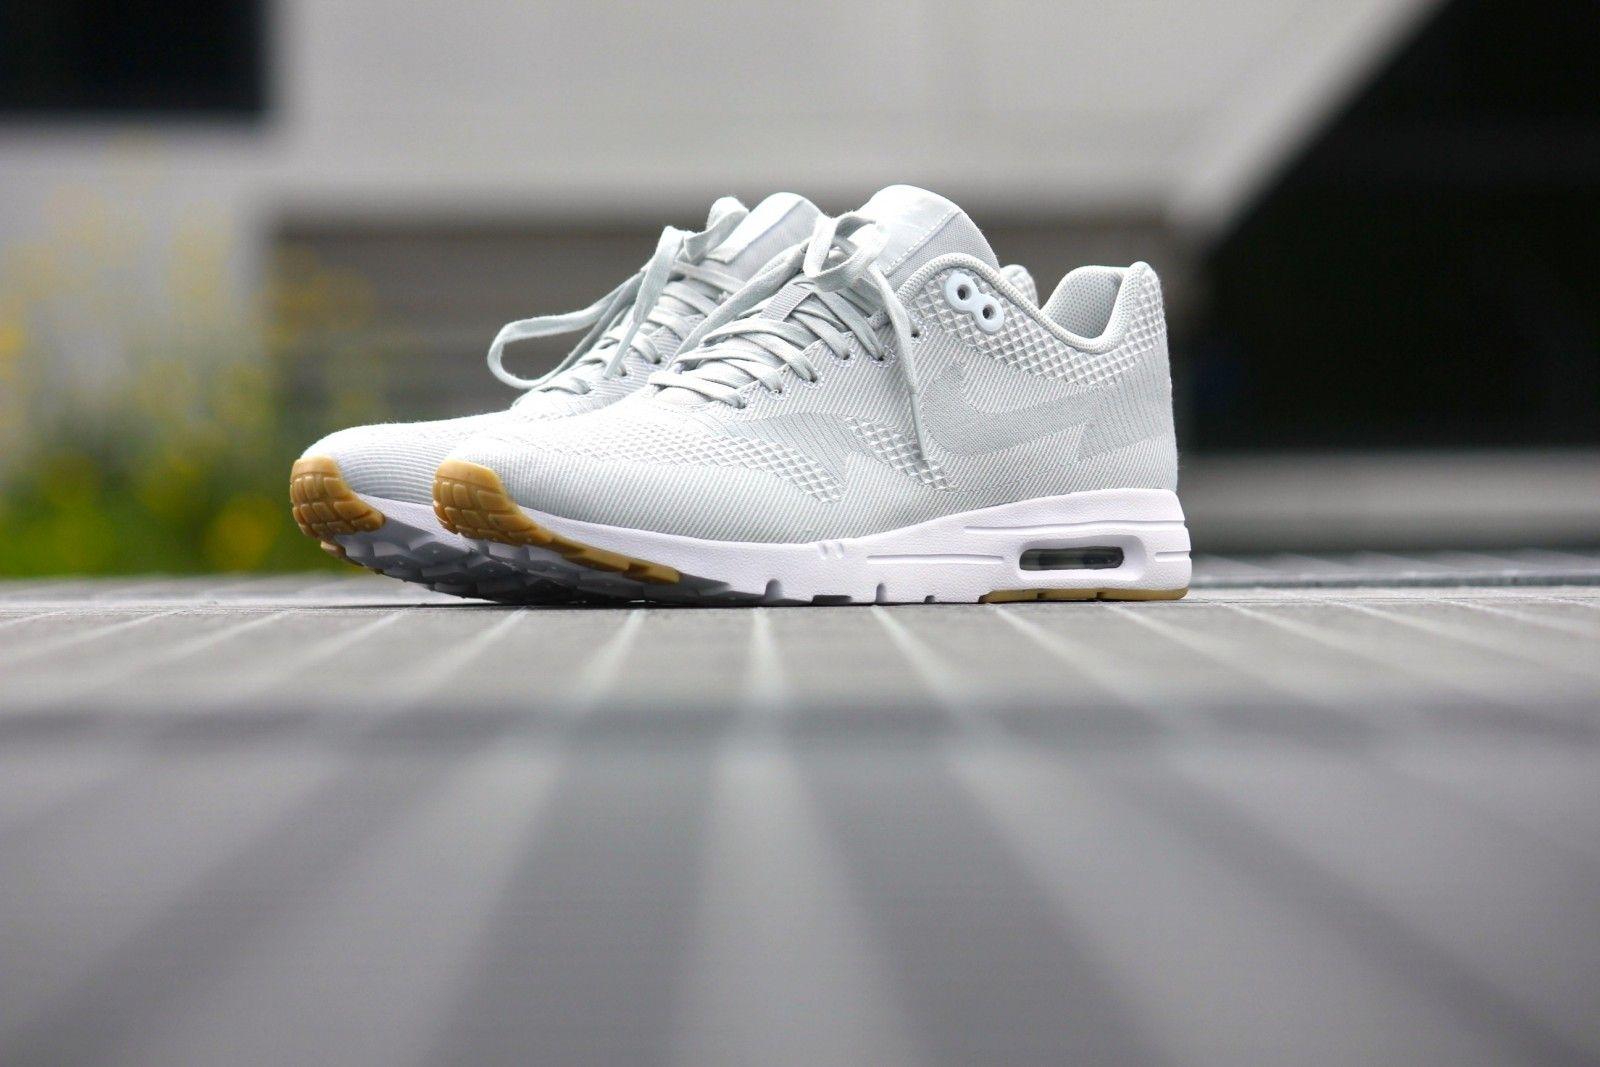 Nike Wmns Air Max 1 Ultra JCRD chaussure pour femme